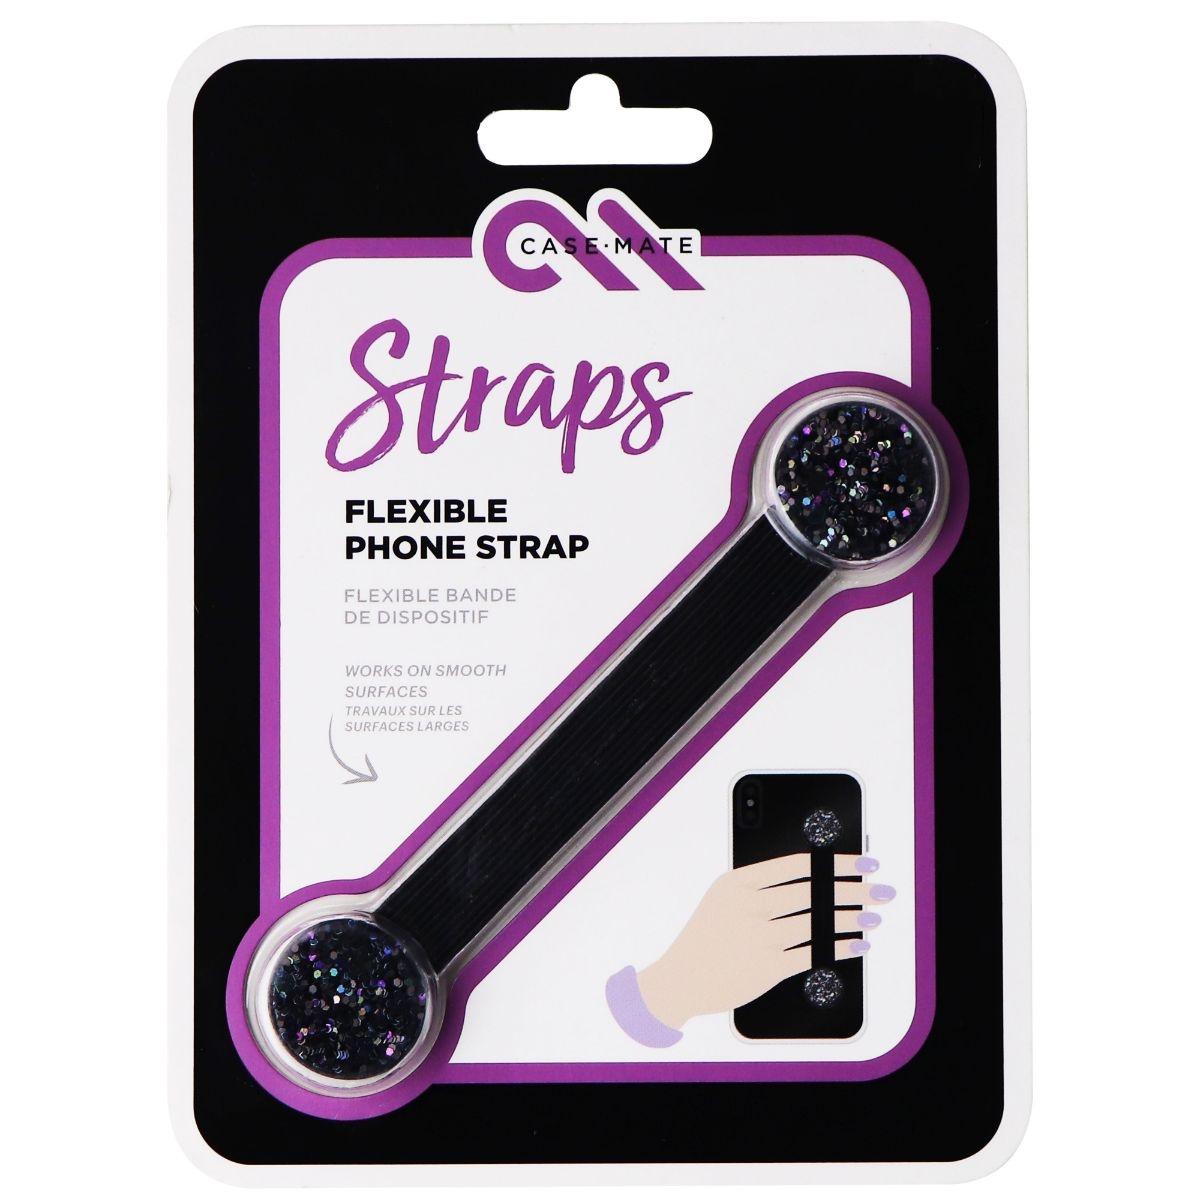 Case-Mate Straps Series Flexible Adhesive Phone Strap - Black Glitter